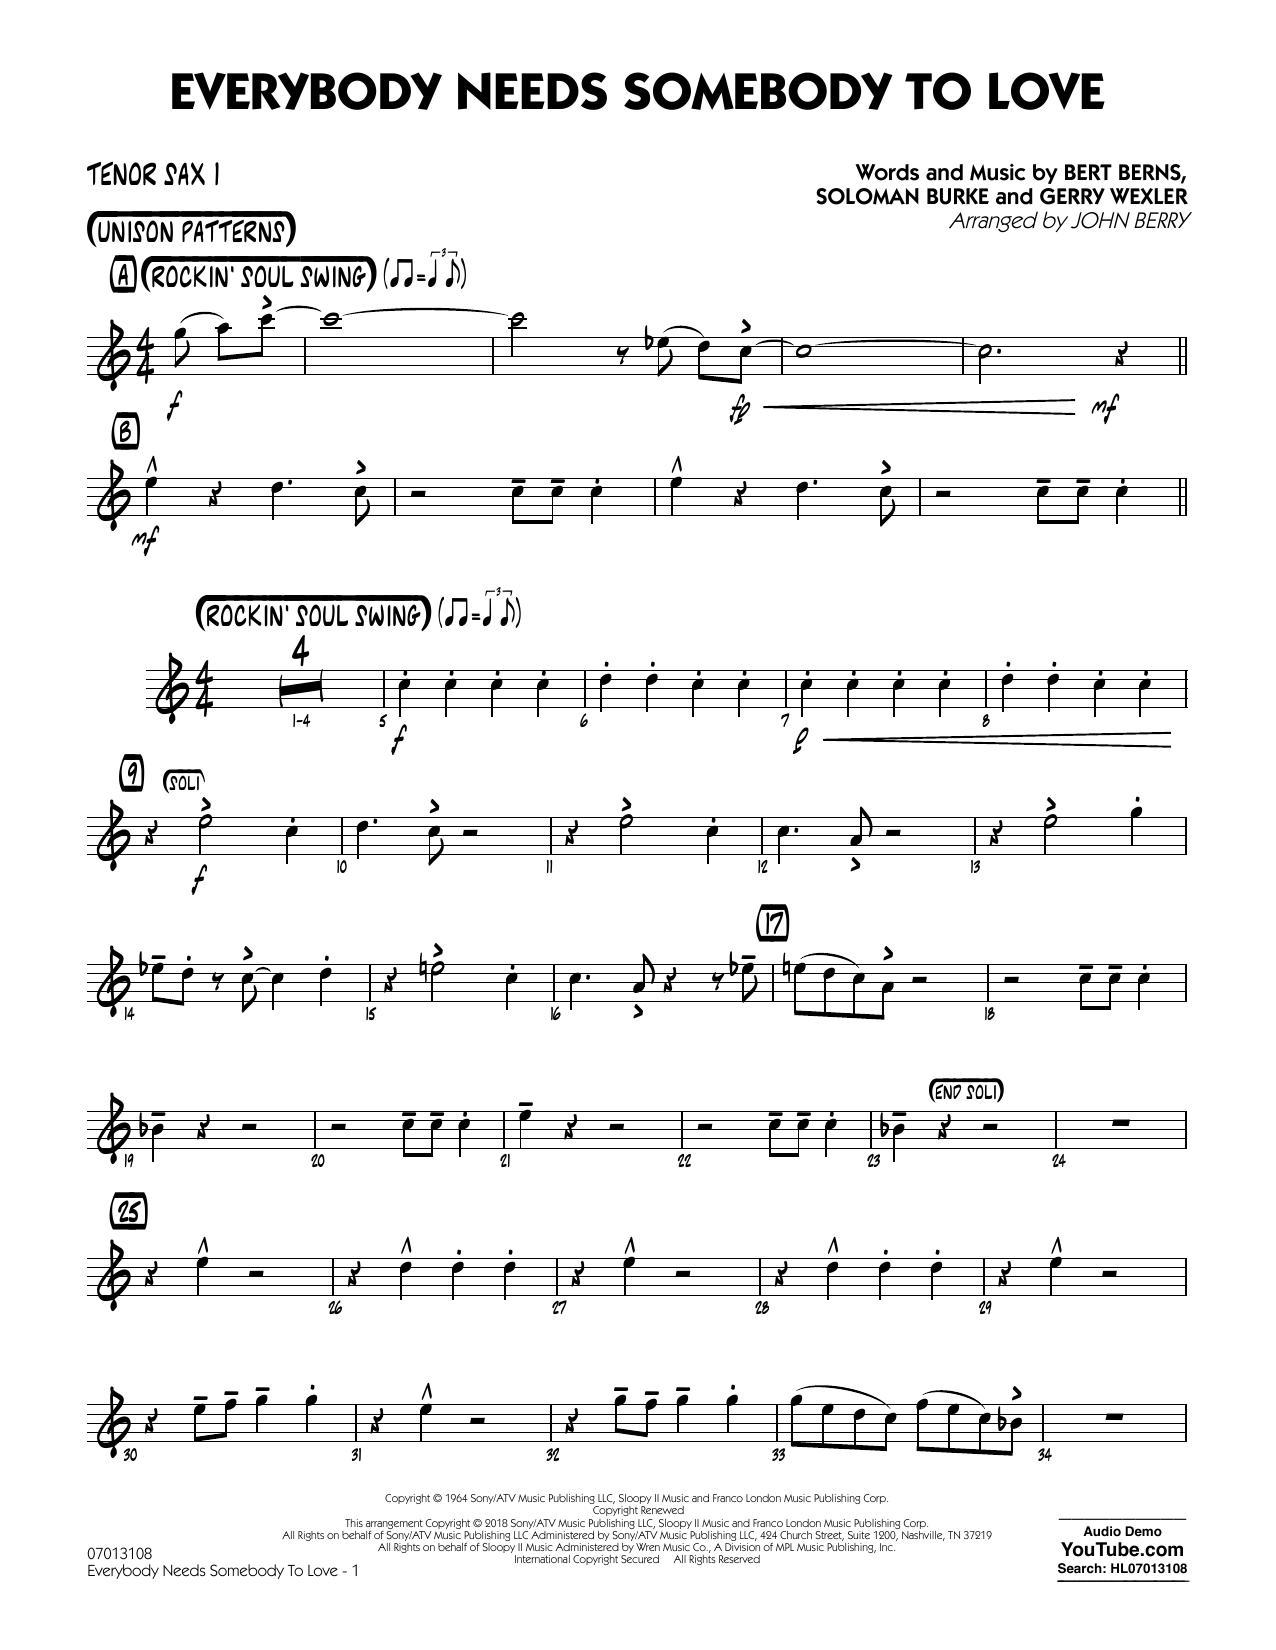 Everybody Needs Somebody to Love - Tenor Sax 1 by Bert Berns, Gerry Wexler,  Soloman Burke - Hal Leonard - Prima Music